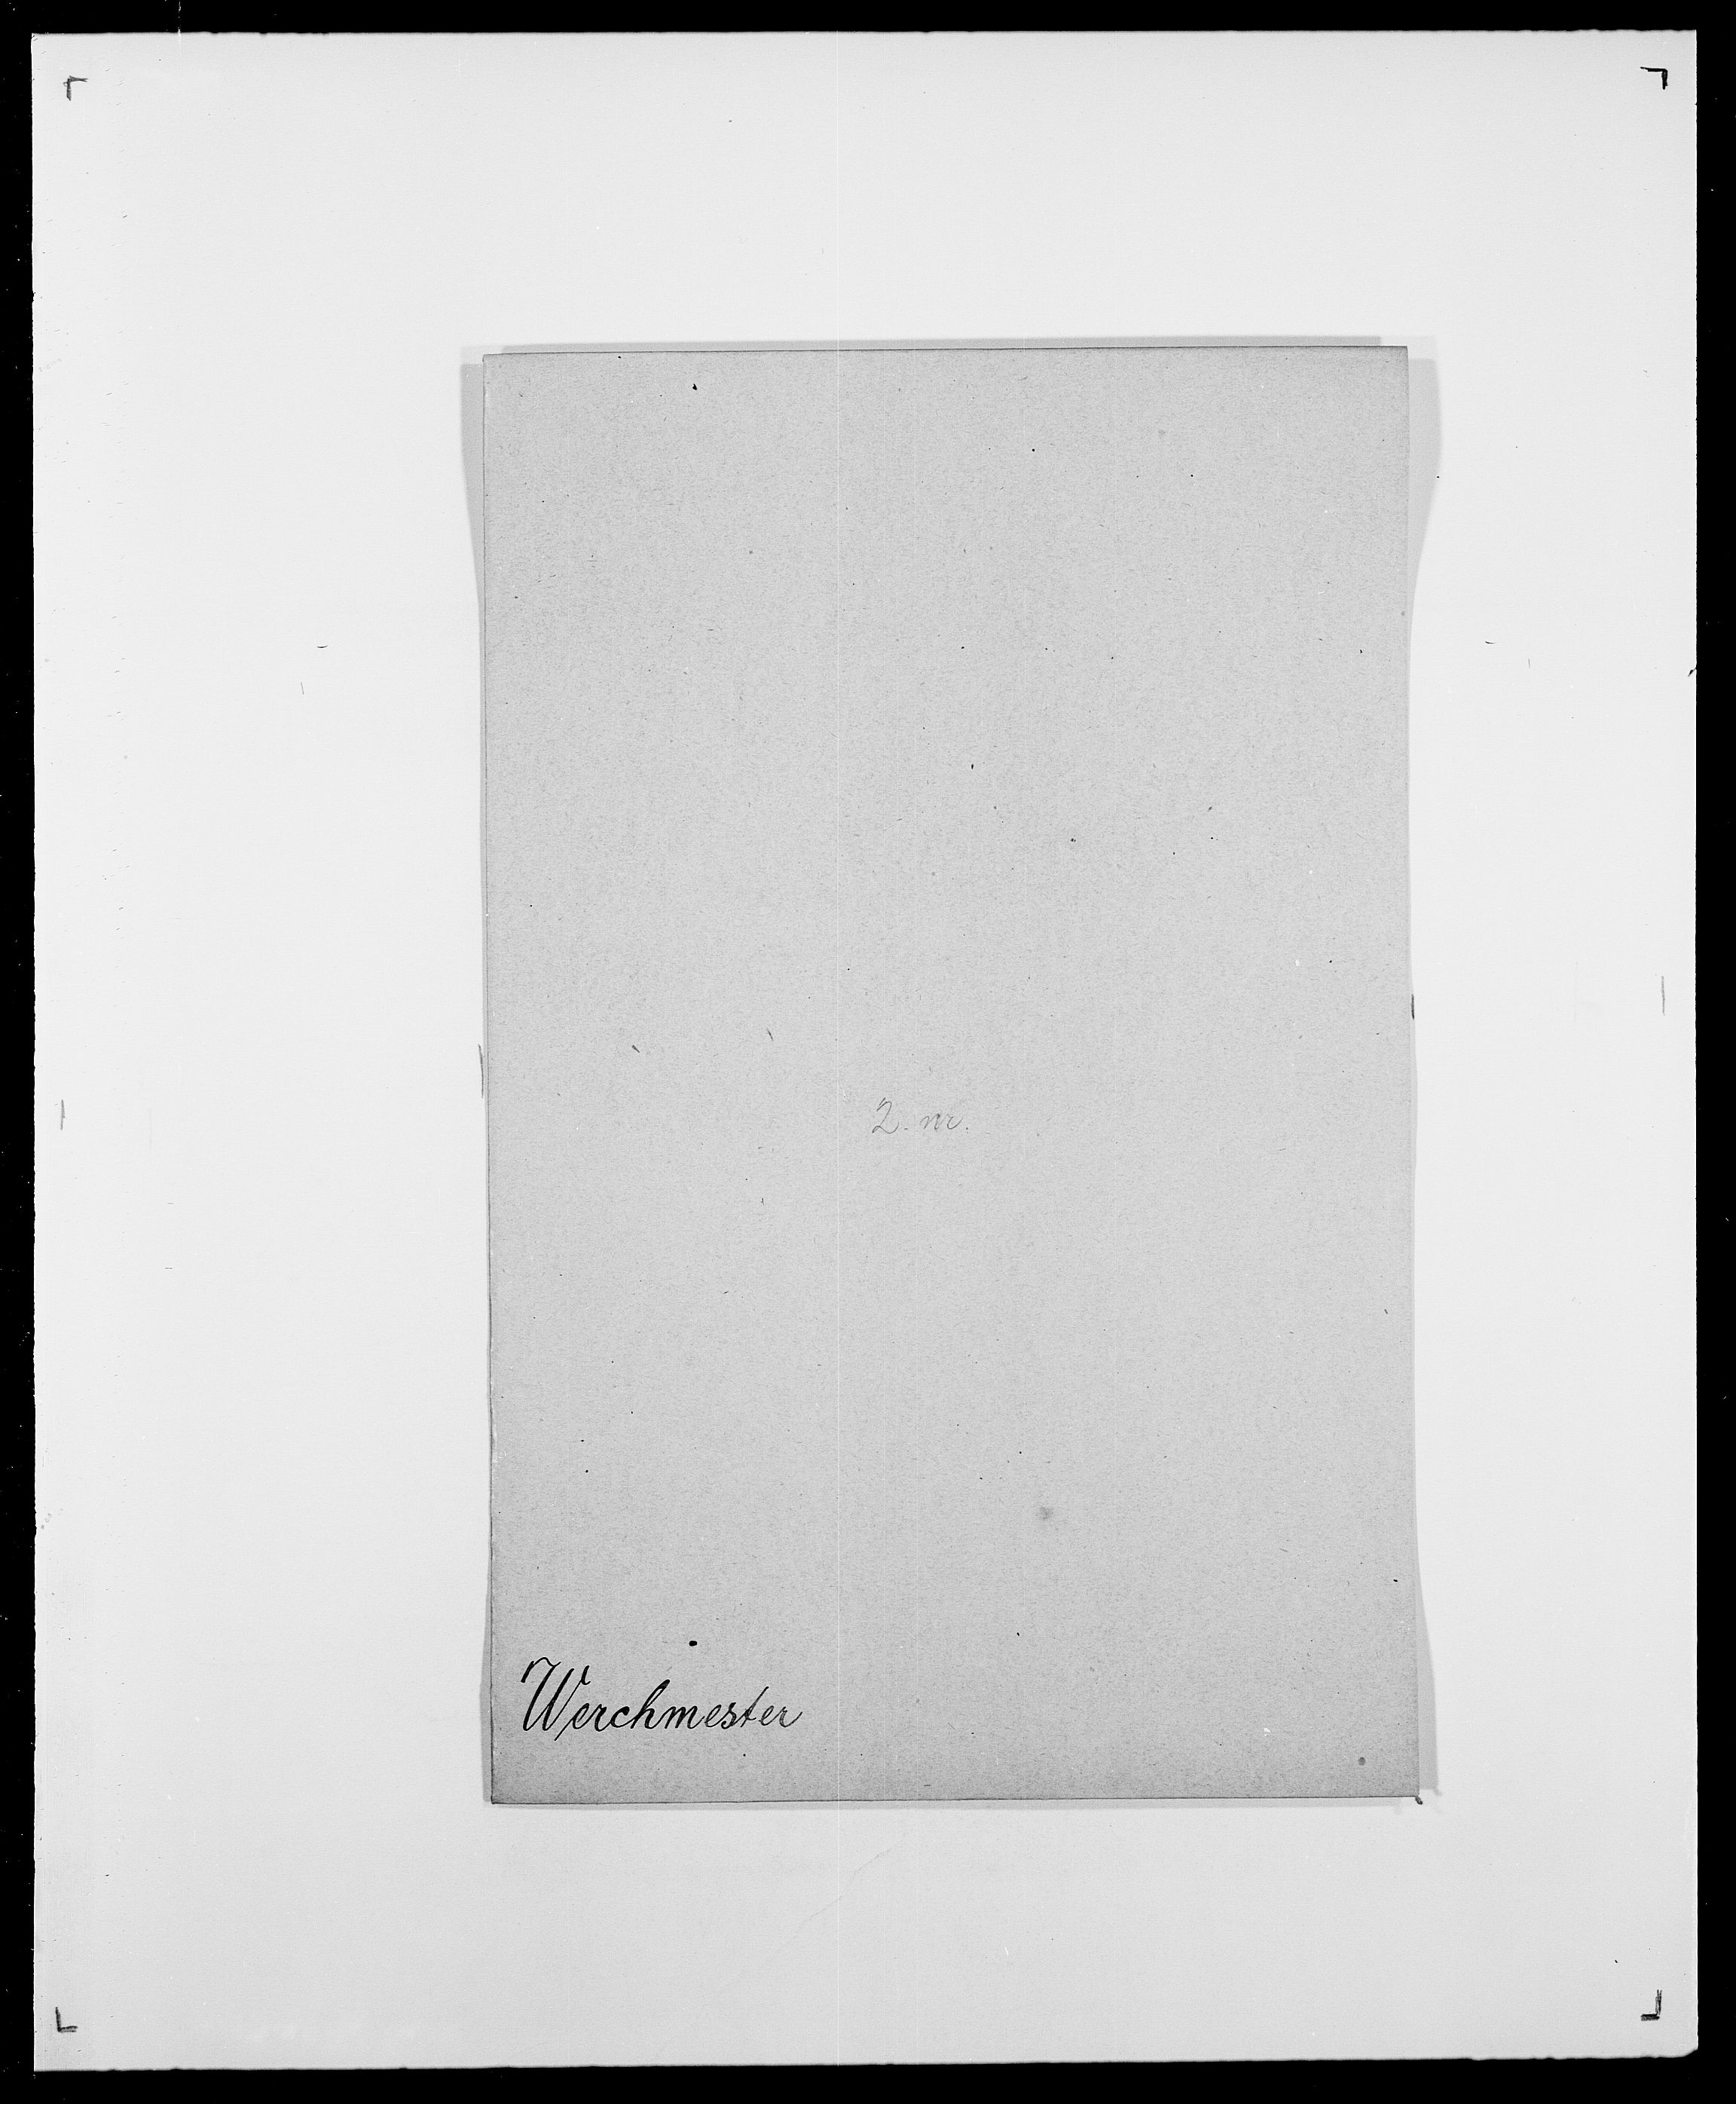 SAO, Delgobe, Charles Antoine - samling, D/Da/L0041: Vemmestad - Viker, s. 55